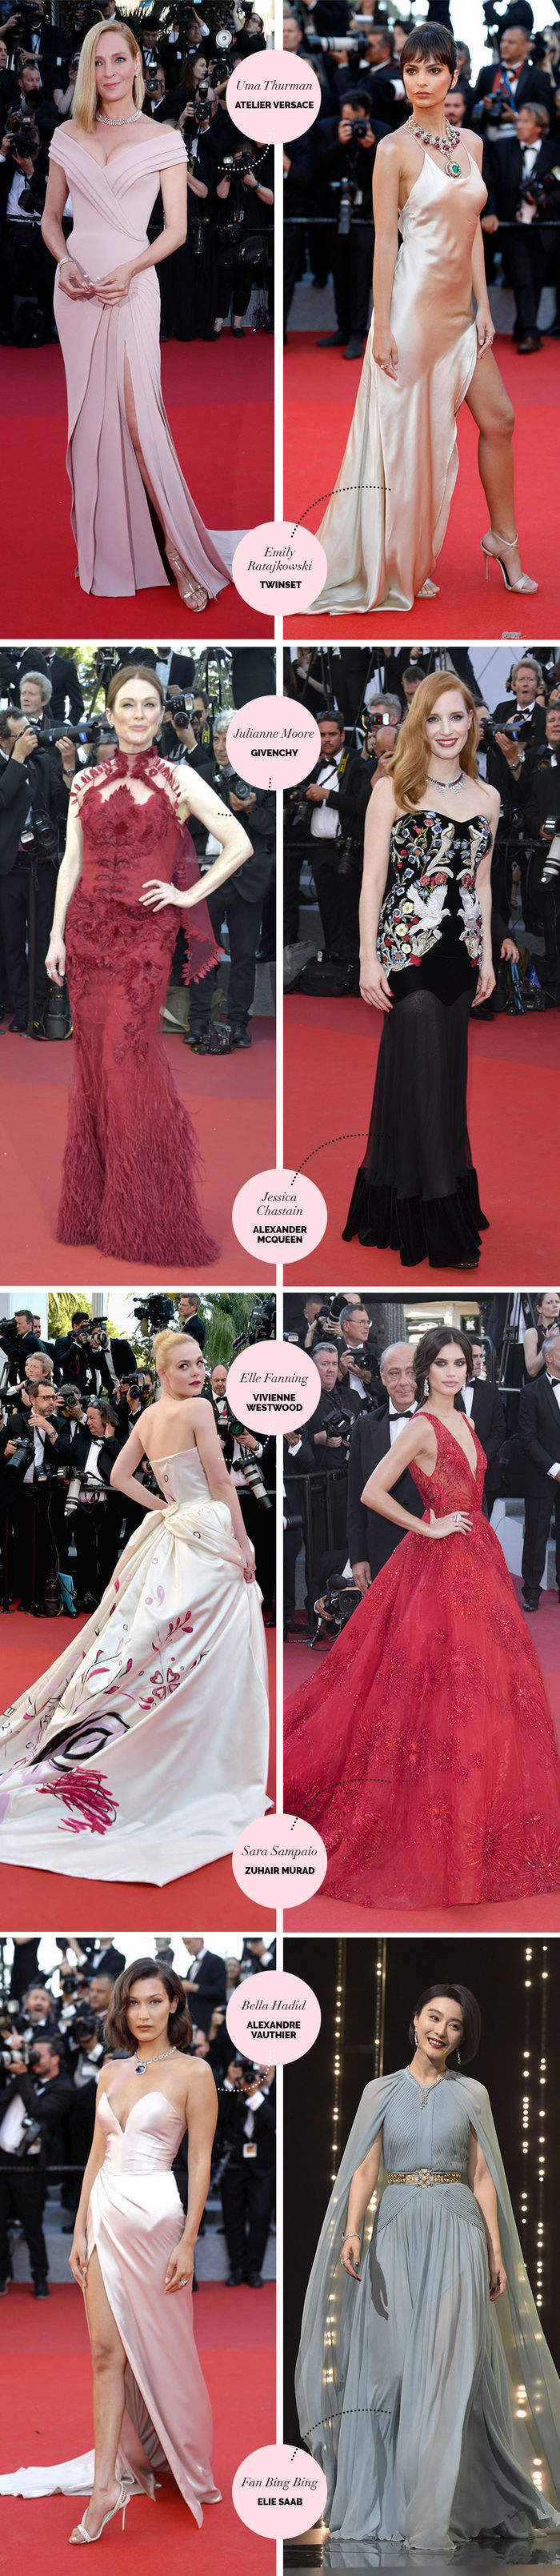 Layla Monteiro Bella Hadid Elle Fanning melhores looks Festival De Cannes 2017